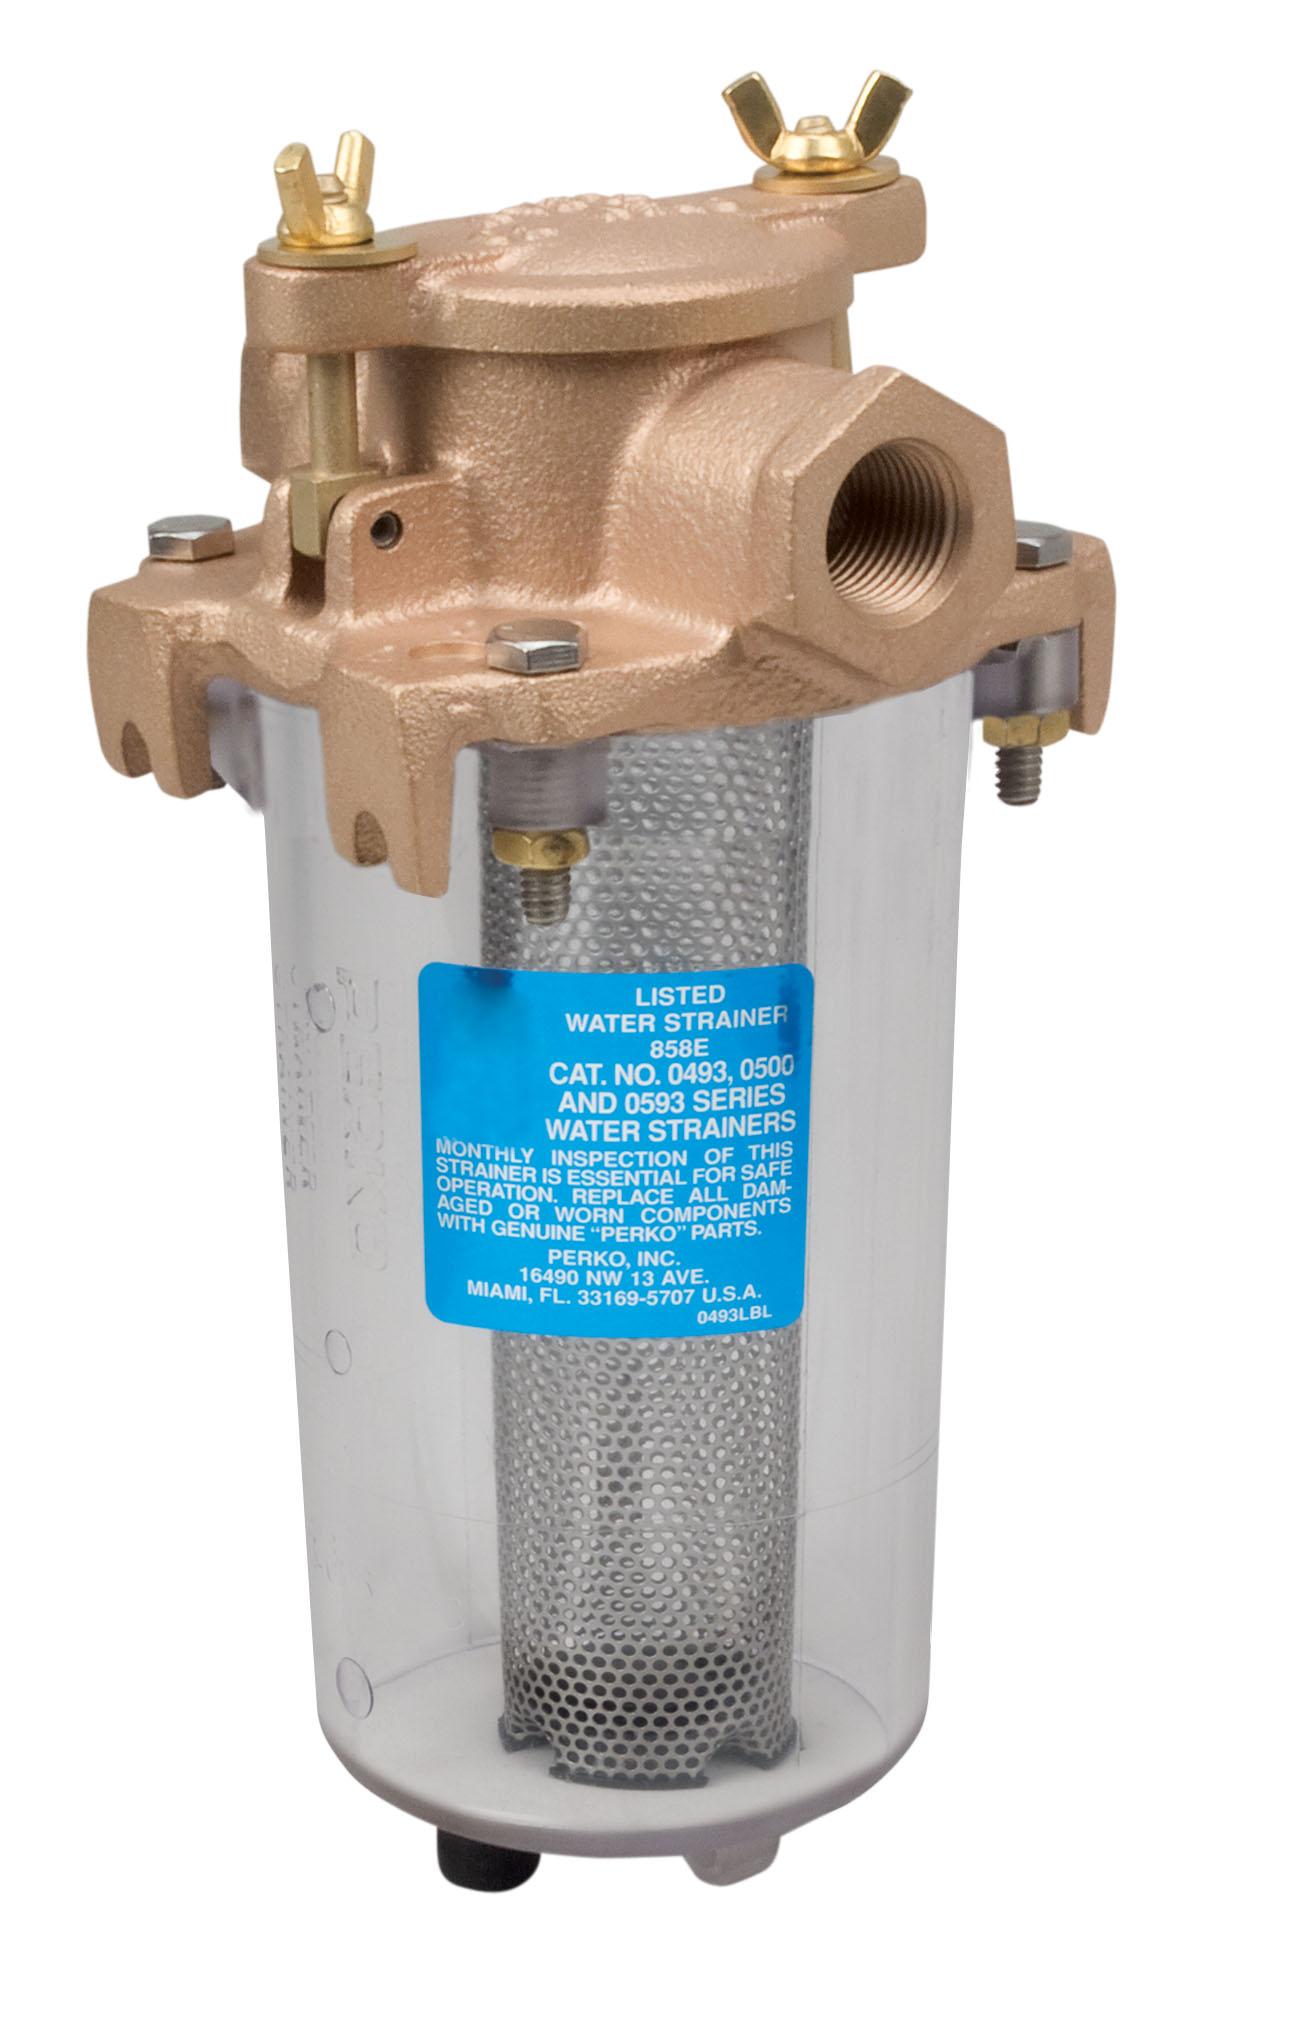 PERKO Inc. - Catalog - Underwater Hardware - Lightweight Intake Water  Strainer [0443]